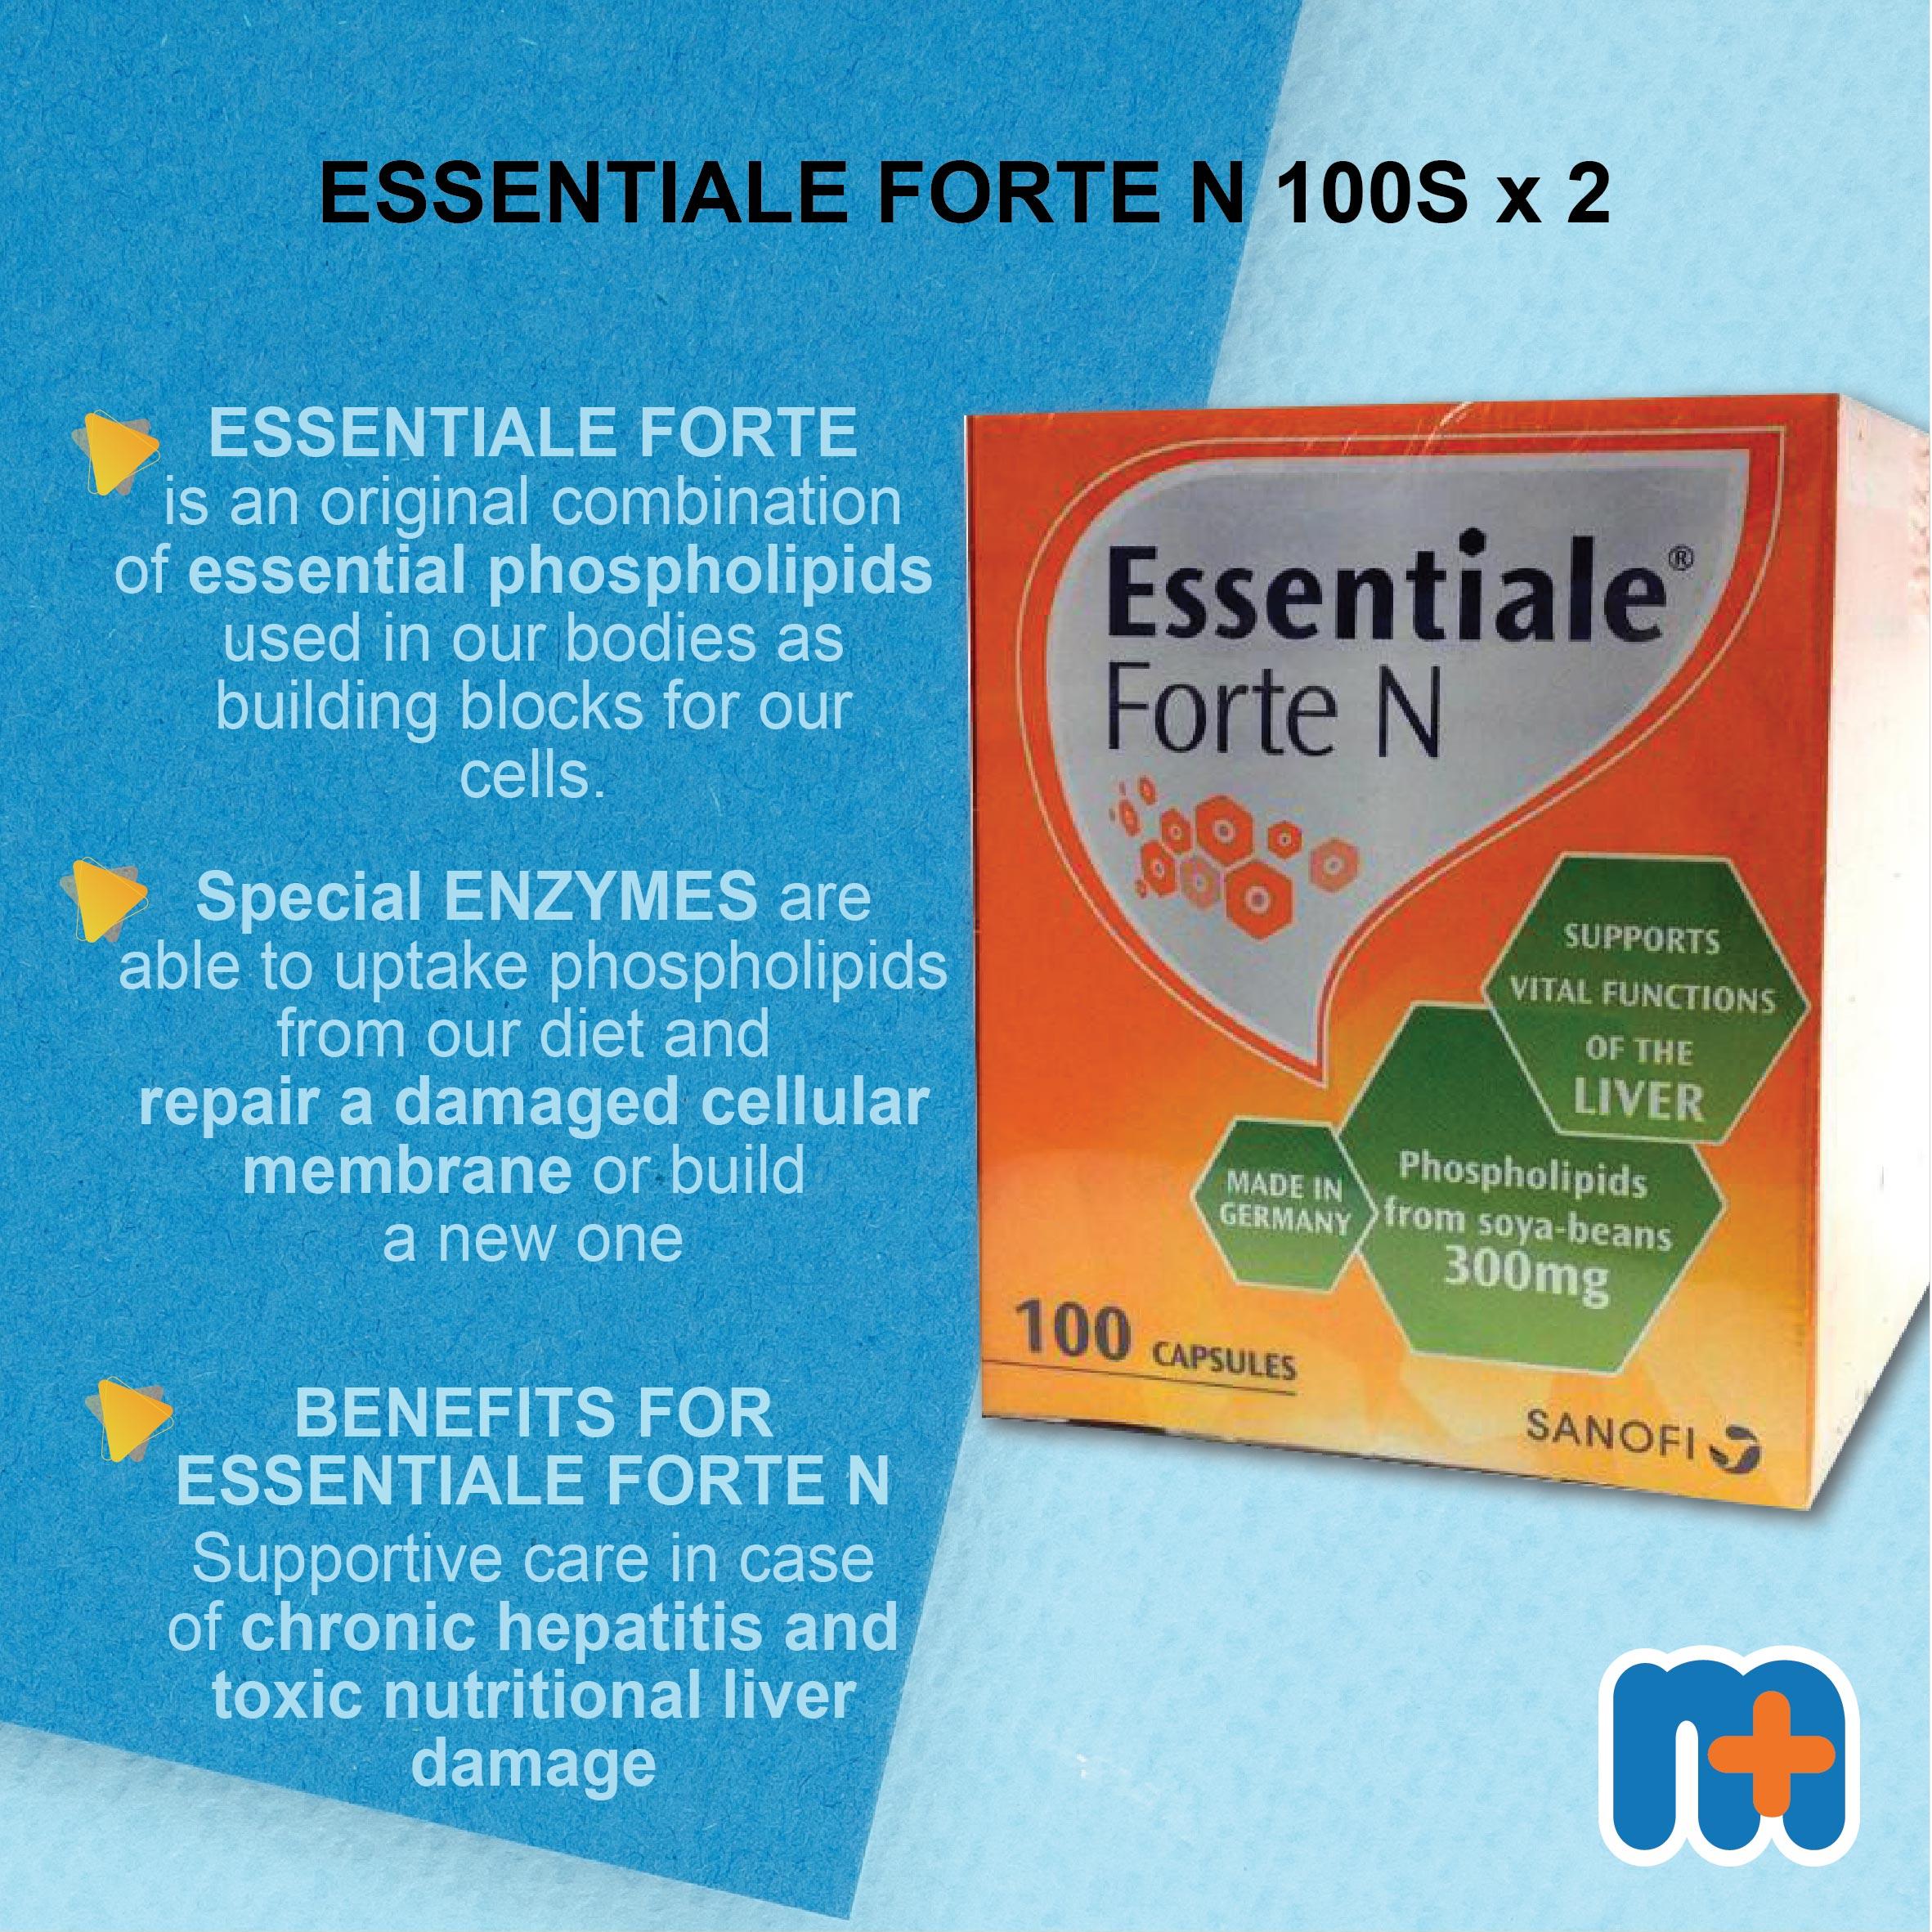 [MPLUS] ESSENTIALE Forte N 100sx2